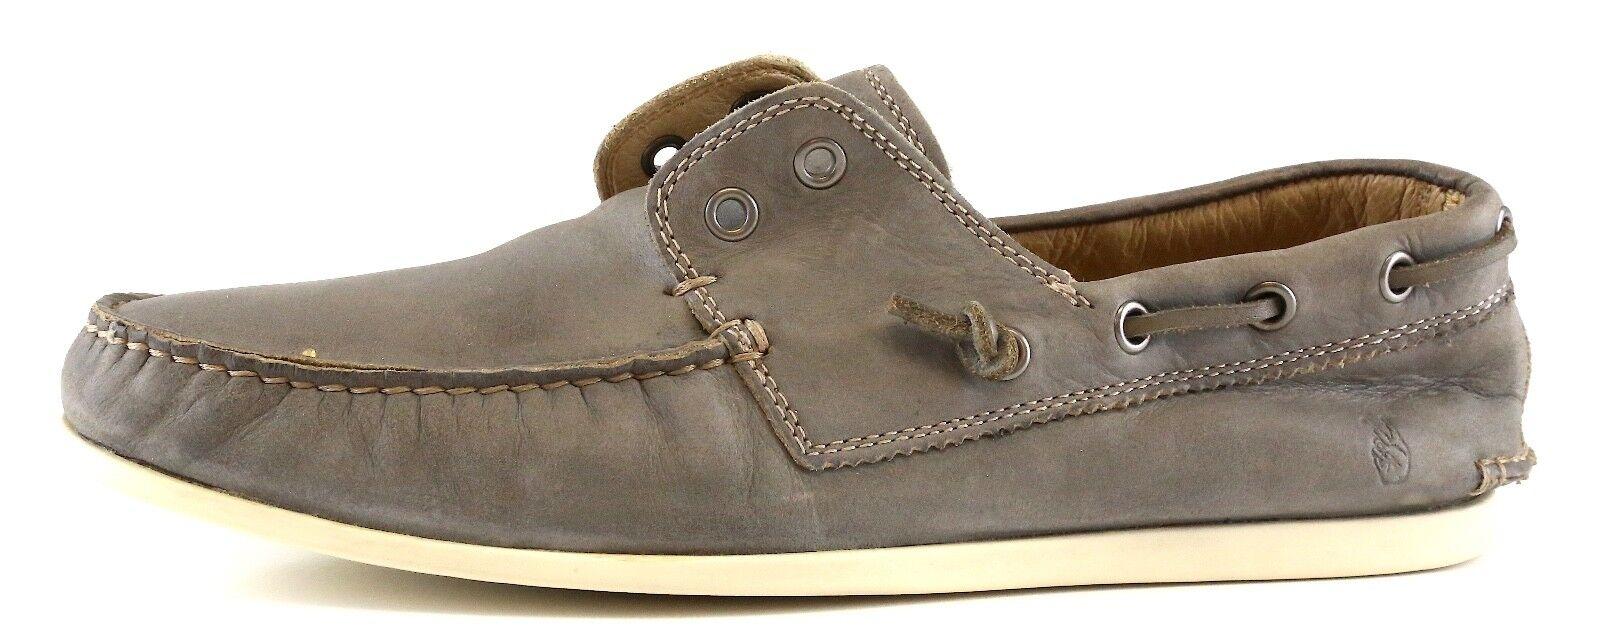 John Varvatos Star USA Slip On Leather Boat shoes Grey Men Sz 8.5 M 4641